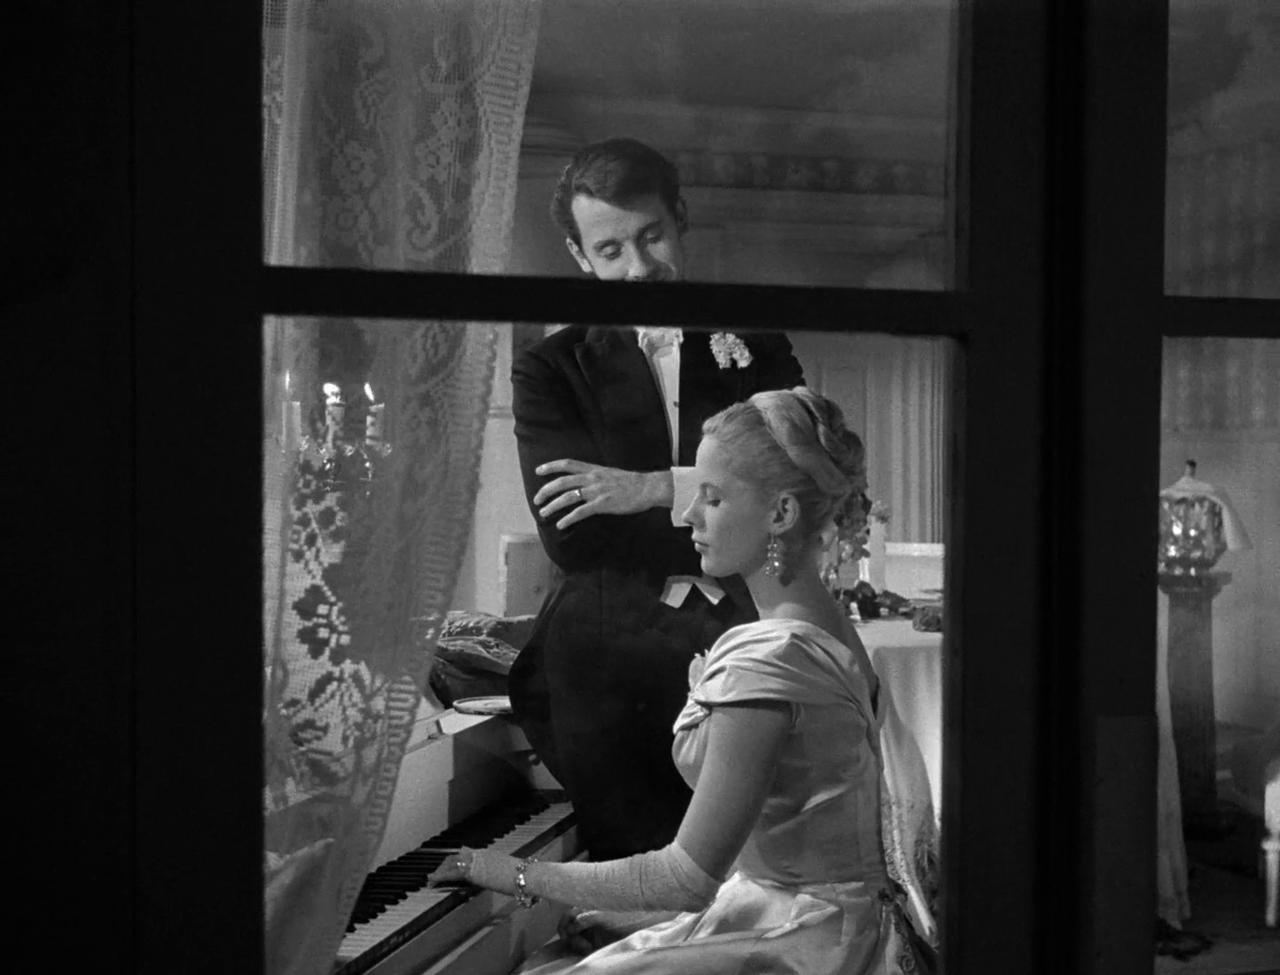 Wild Strawberries (1957, Ingmar Bergman) / Cinematography